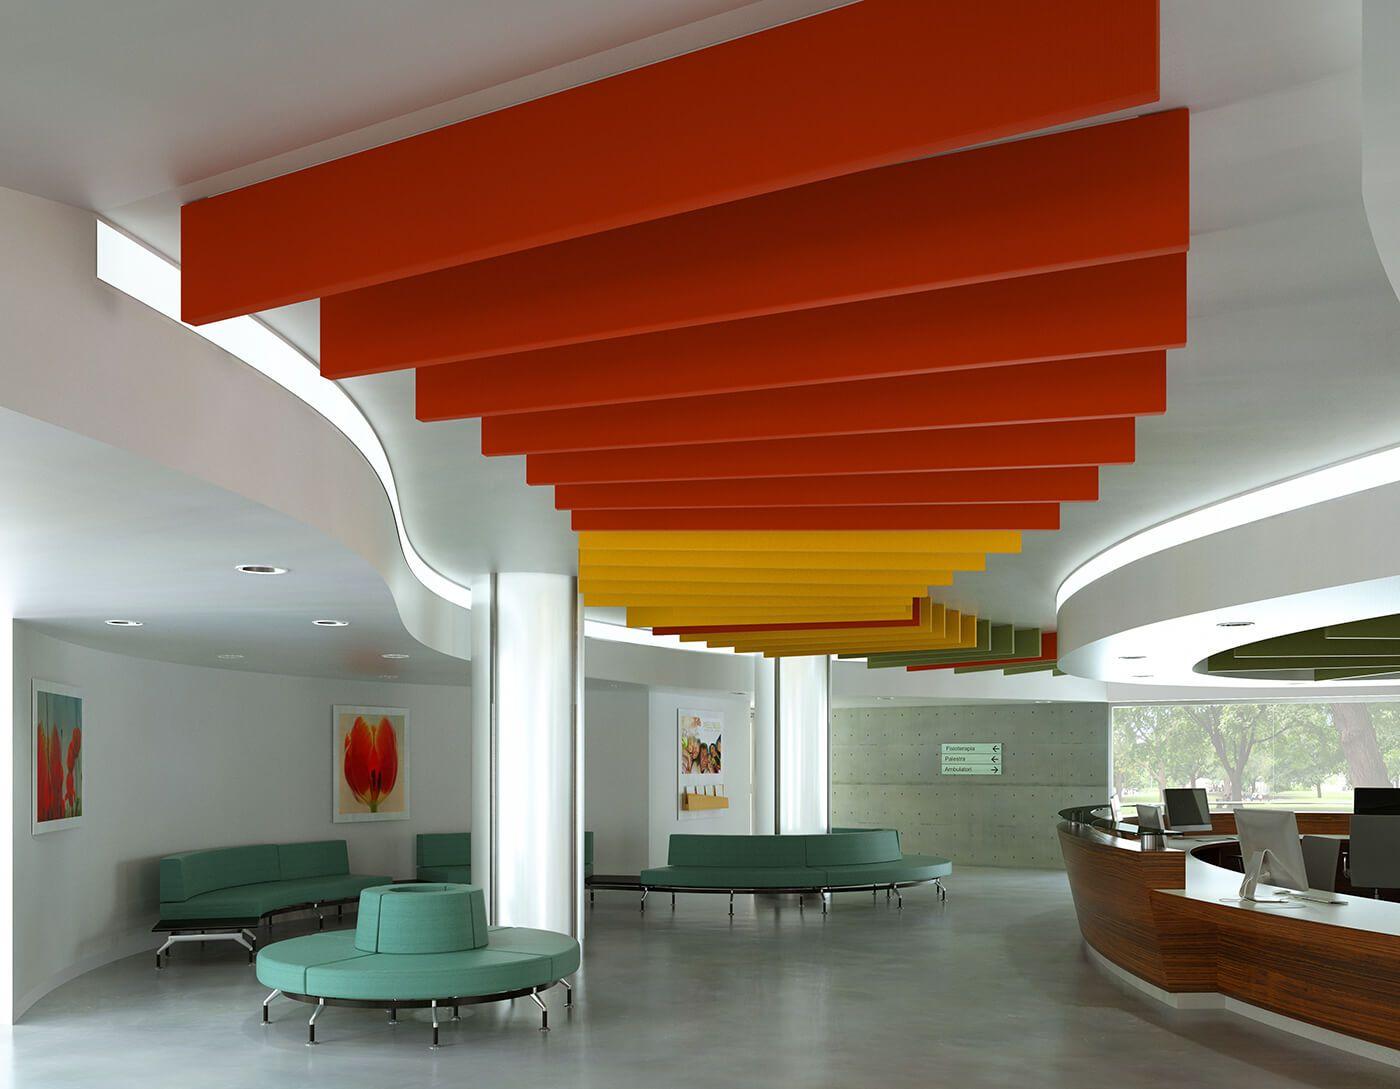 Ospital Acoustic comfort, Flag sound absorbing panels